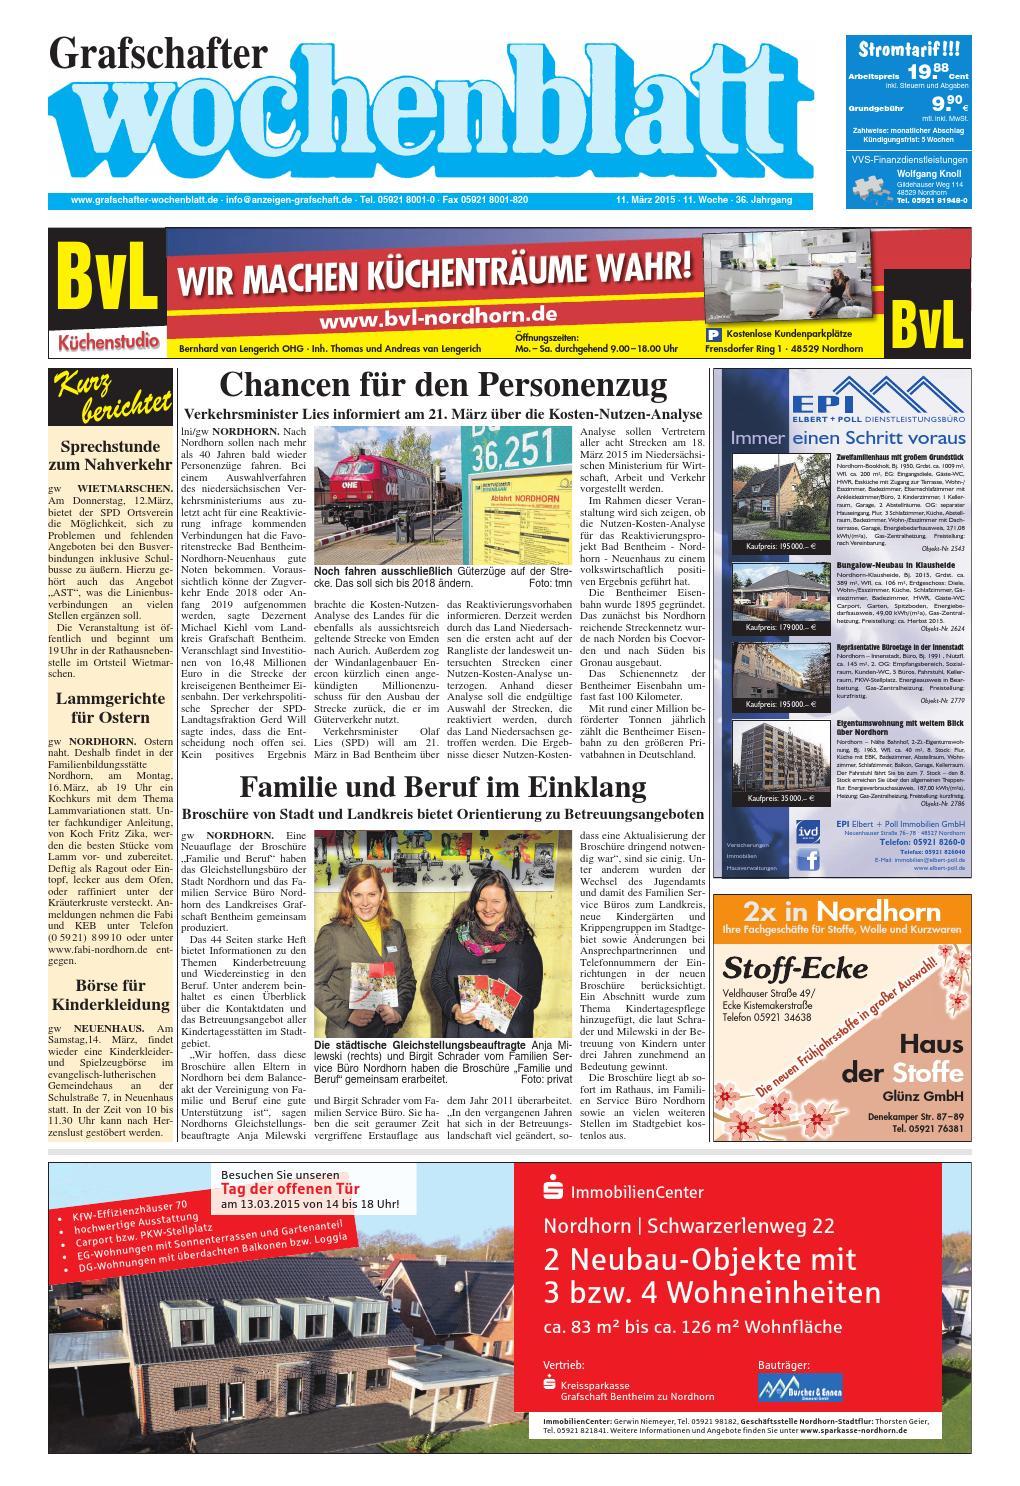 Grafschafter Wochenblatt_11.3.2015 by SonntagsZeitung - issuu